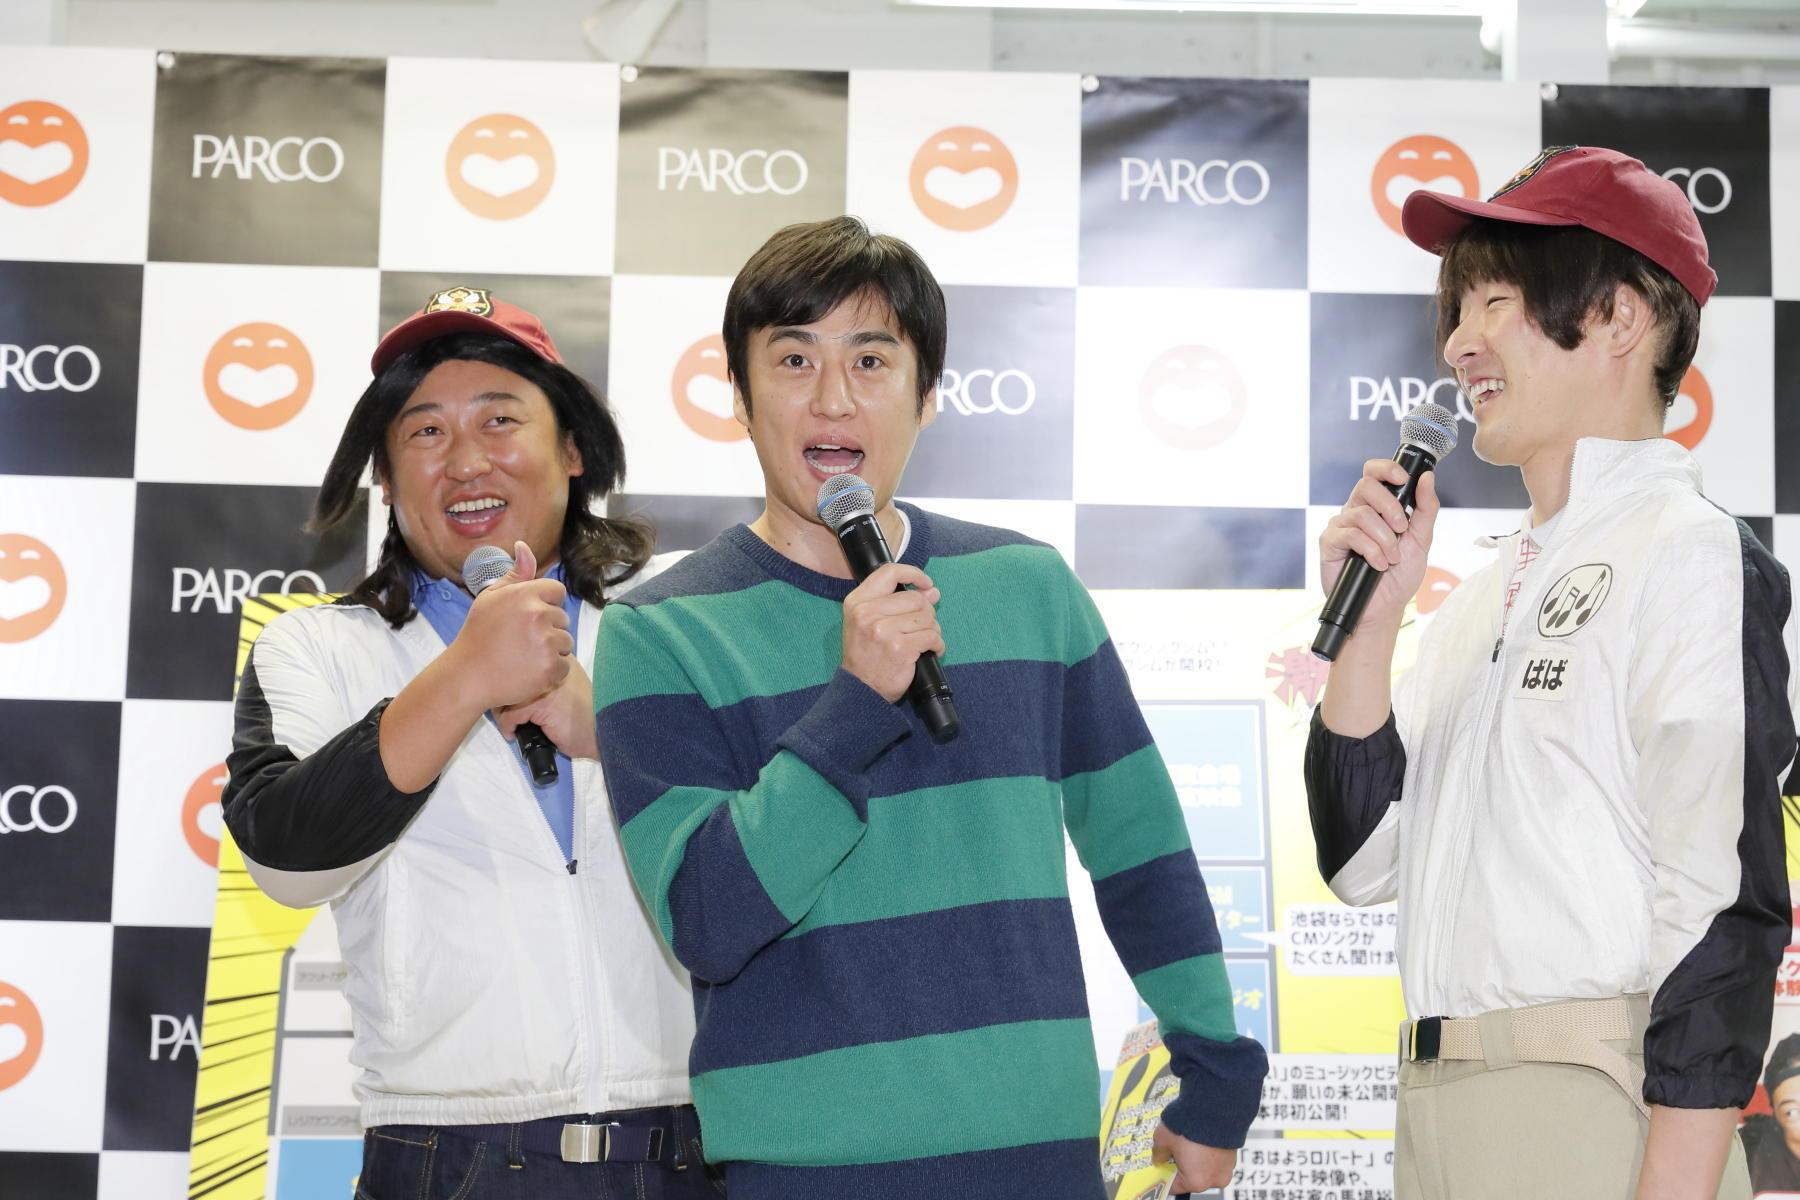 http://news.yoshimoto.co.jp/20181207184541-bbc13e07f45055174afb33ae98c919bfb40c1a3f.jpg